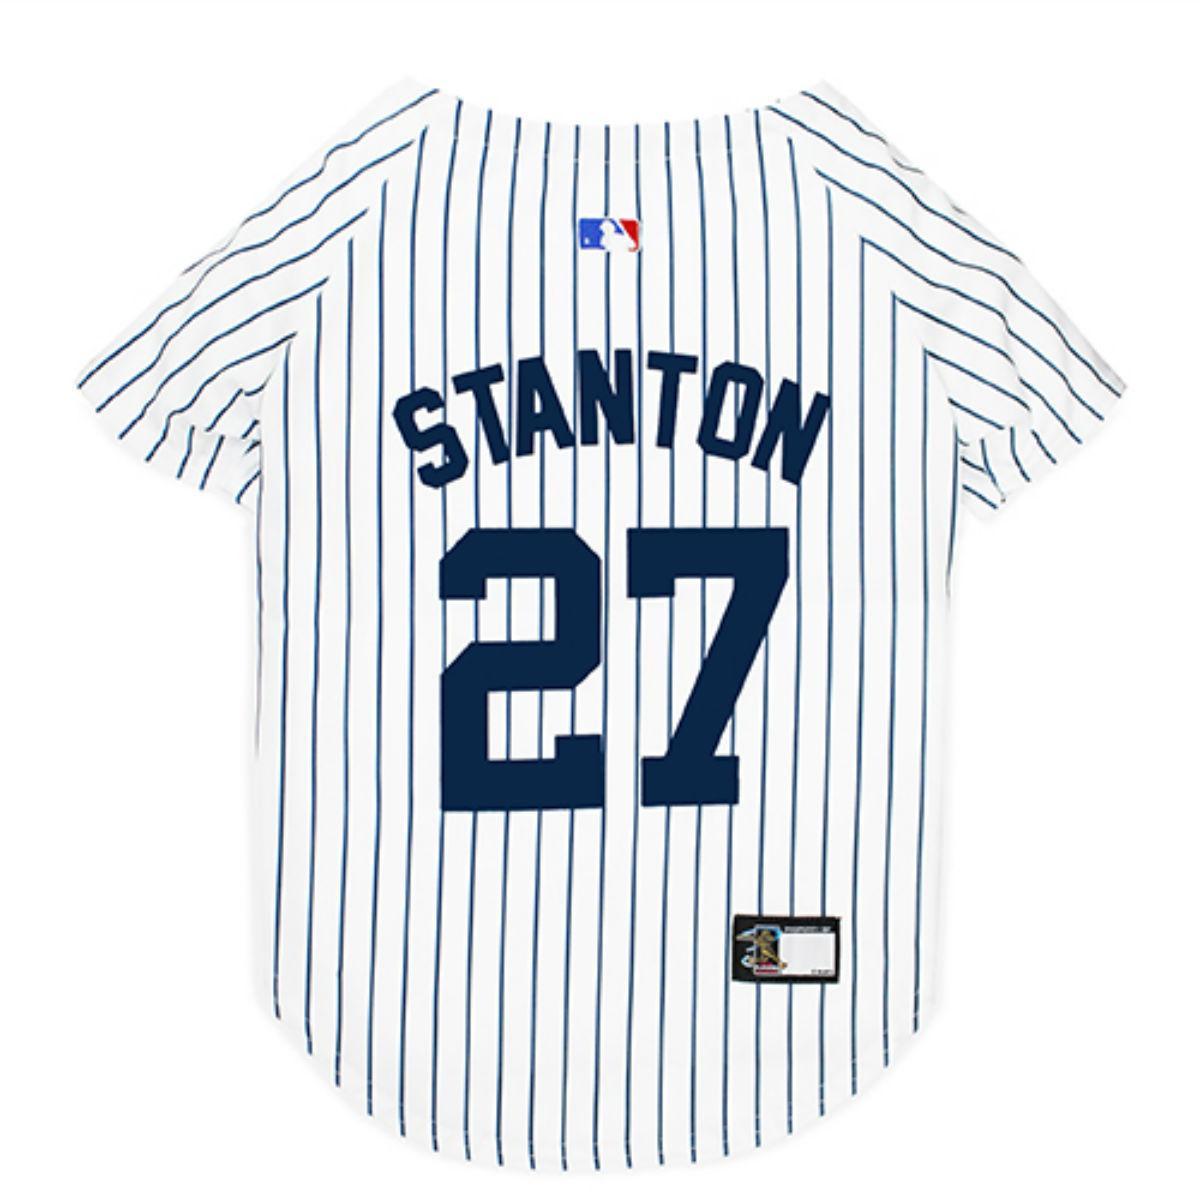 New York Yankee Giancarlo Stanton Dog Jersey - Pinstripe